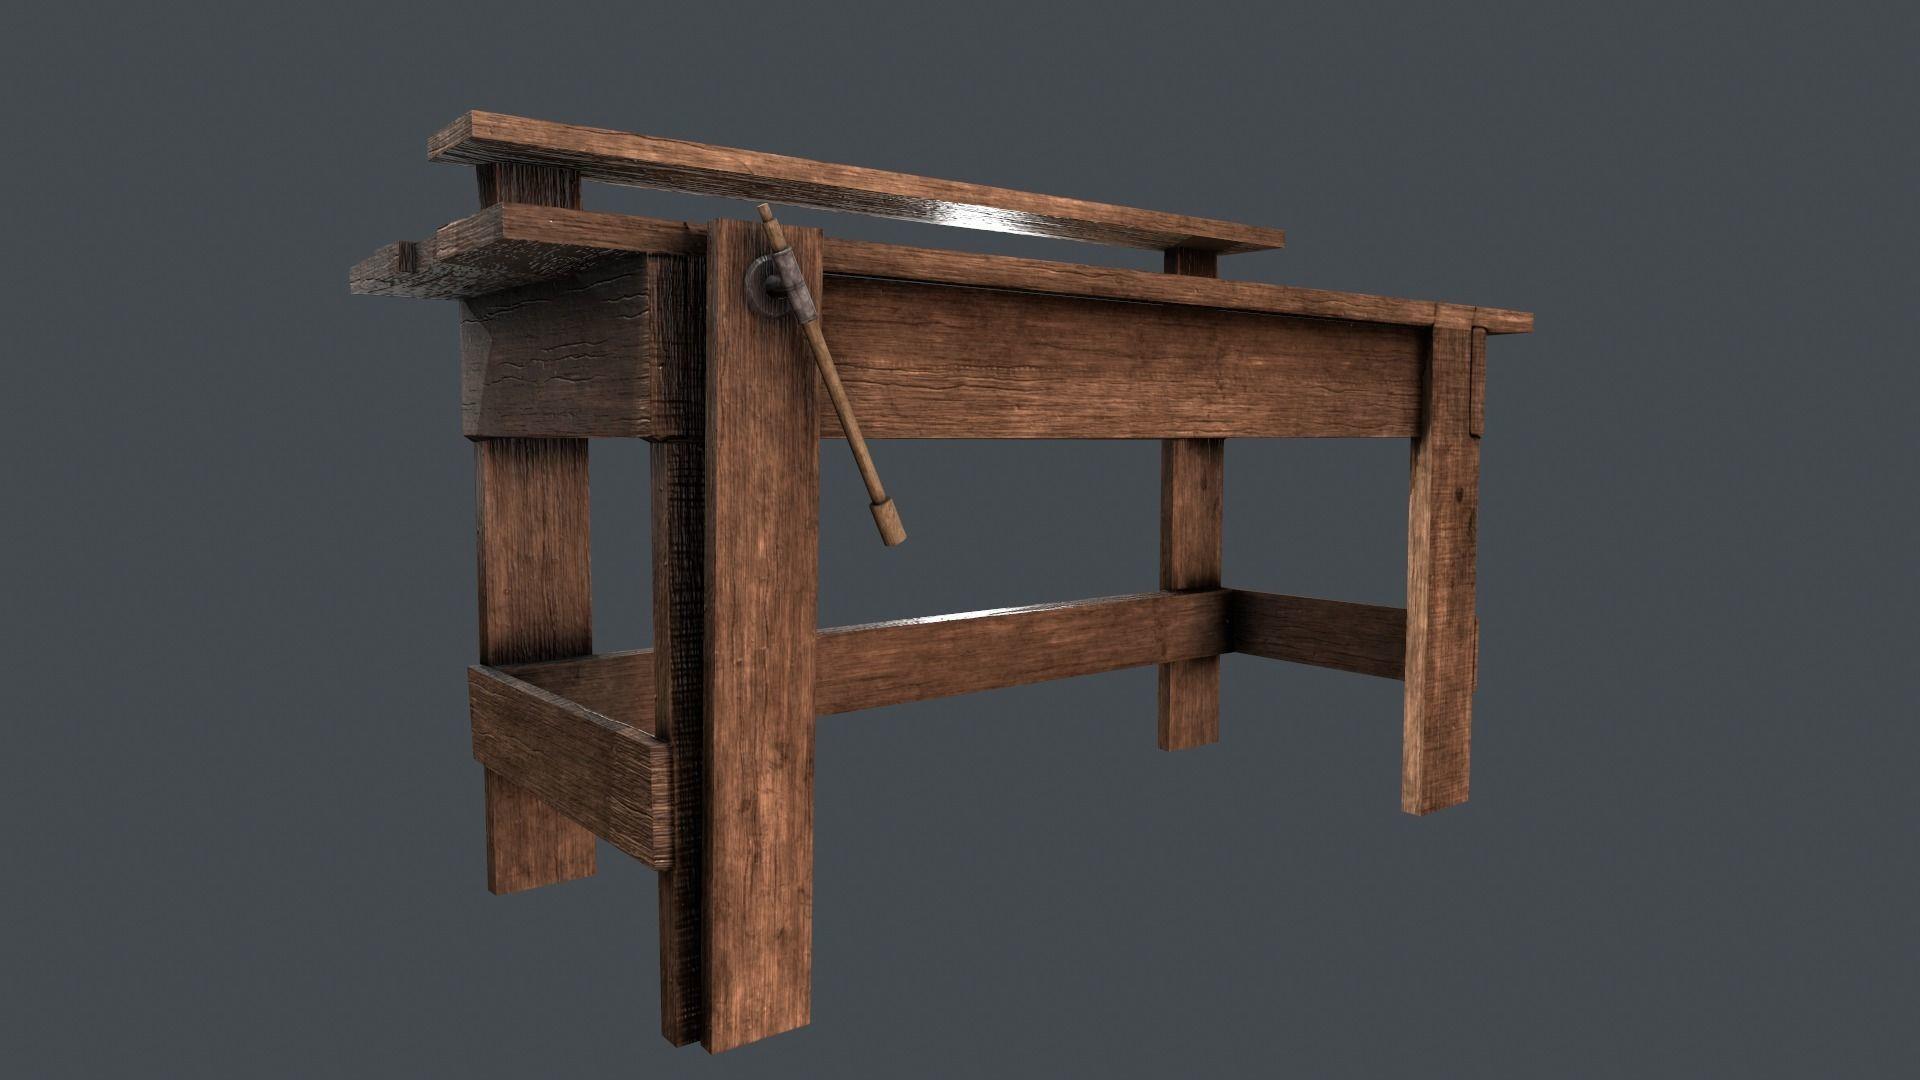 Sensational Lowpoly Workbench 3D Model Evergreenethics Interior Chair Design Evergreenethicsorg